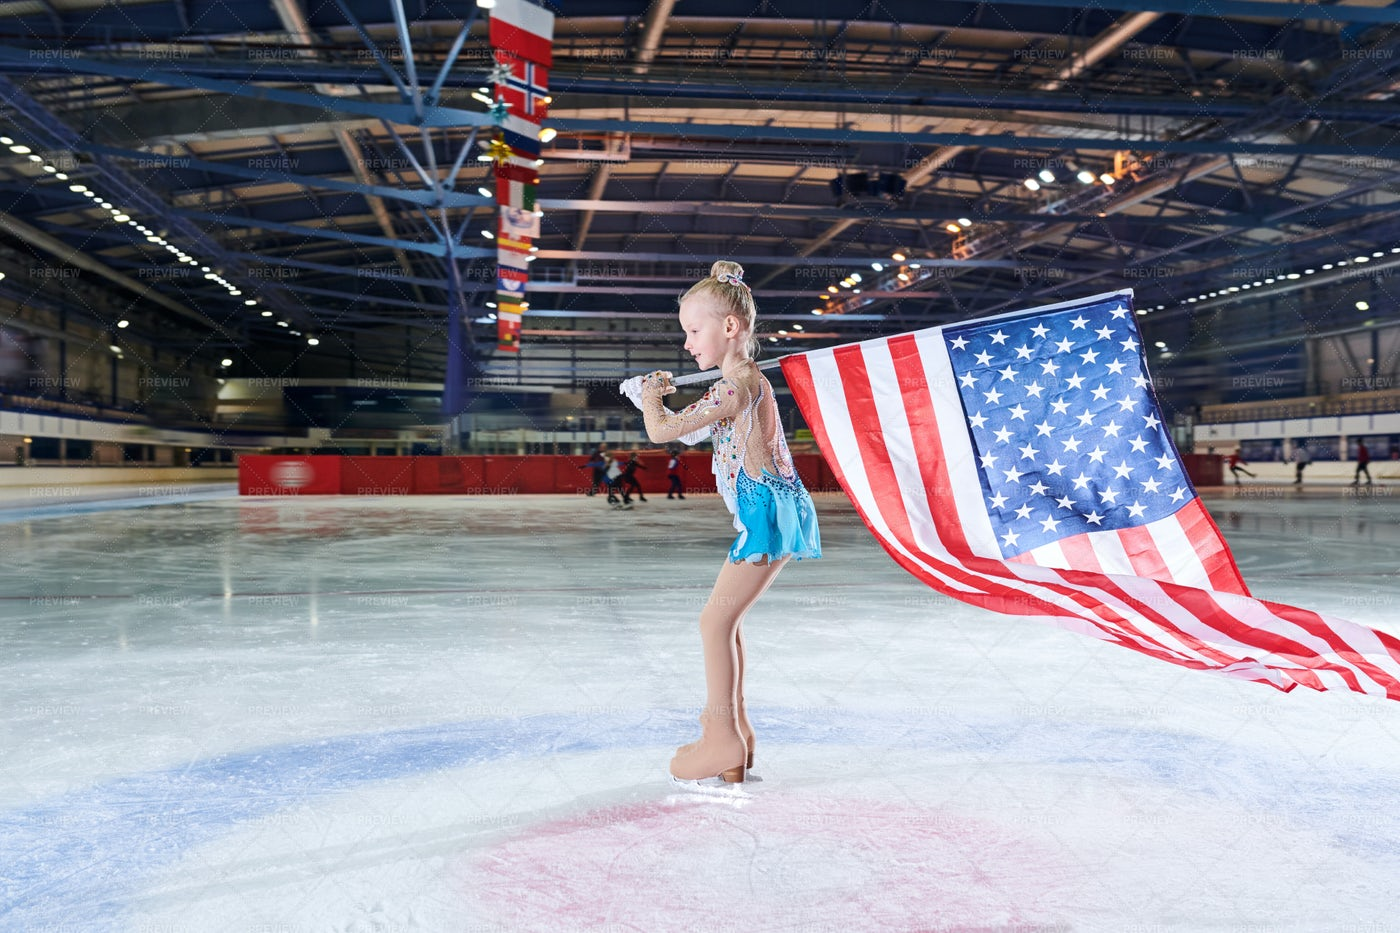 Girl Figure-Skating Carrying...: Stock Photos